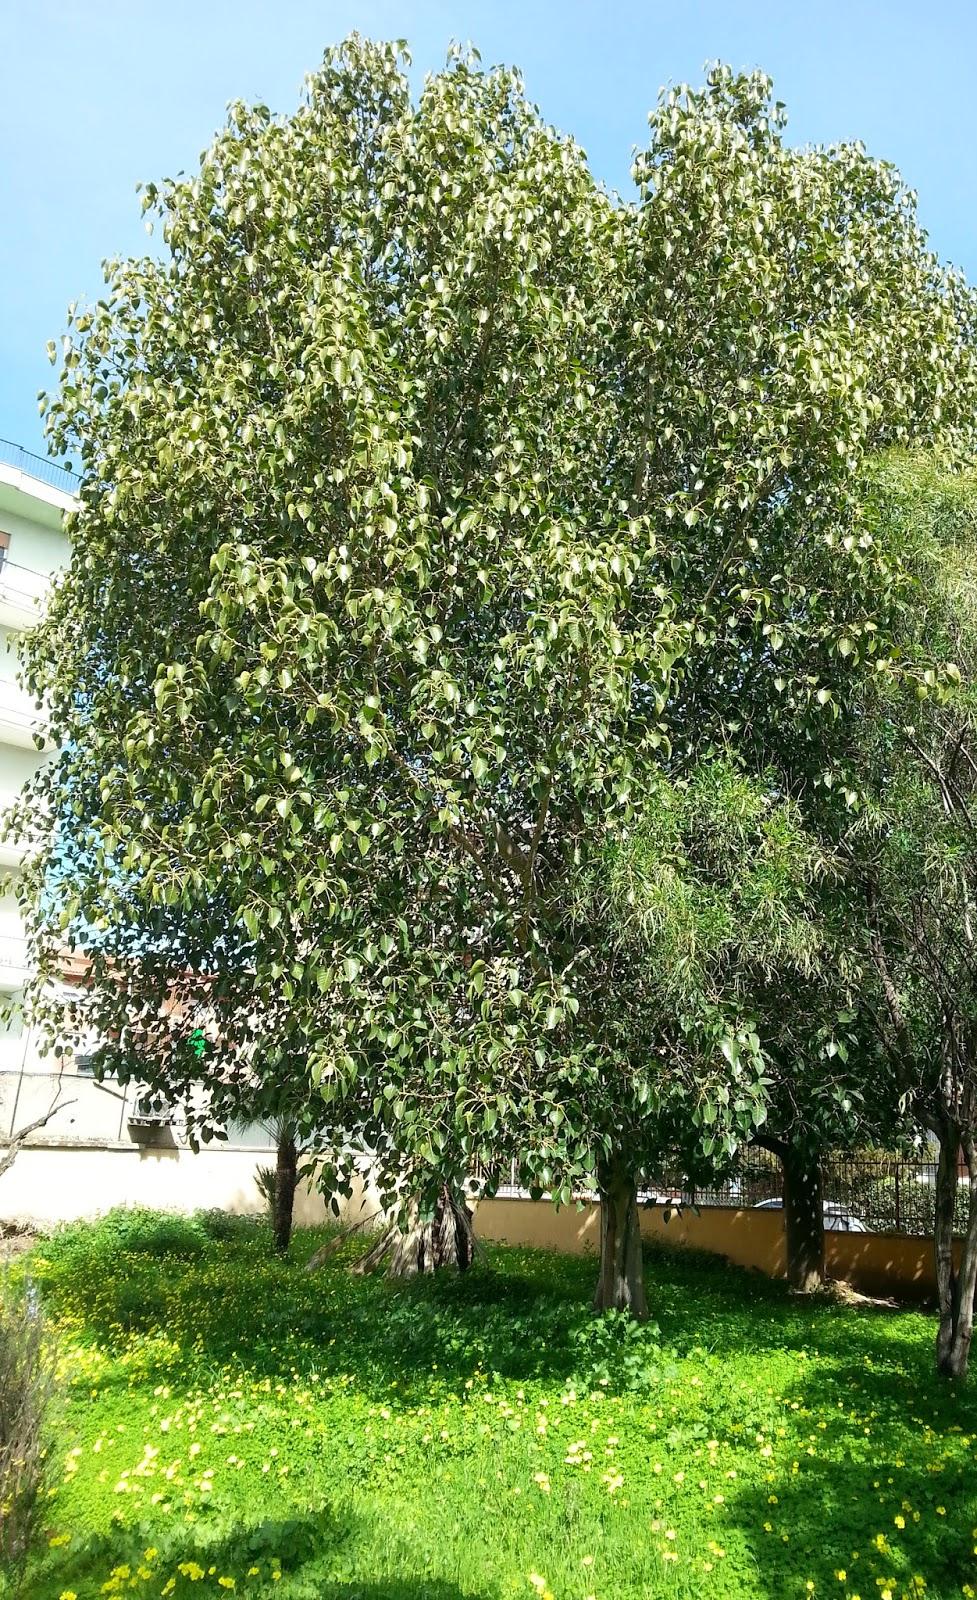 gli alberi da giardino sempre verdi – Mekan.info